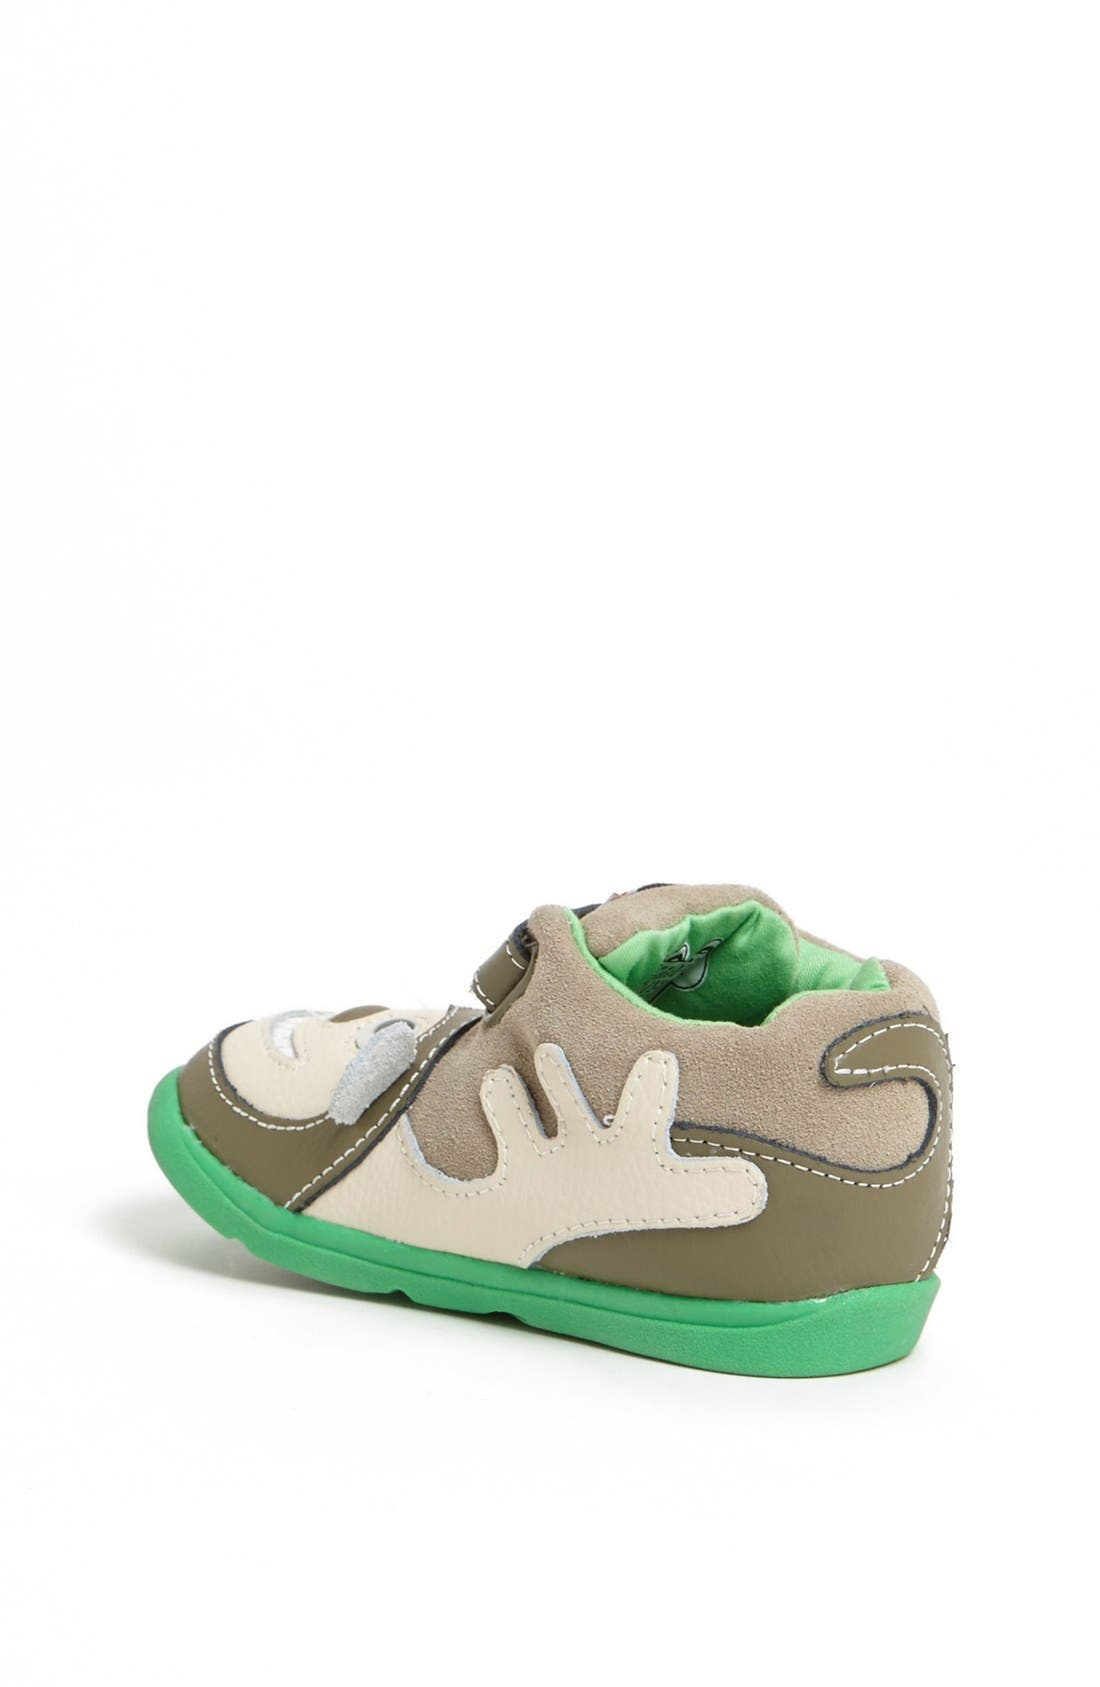 Alternate Image 2  - Zooligans™ 'Bobo the Monkey' Sneaker (Baby, Walker, Toddler & Little Kid)